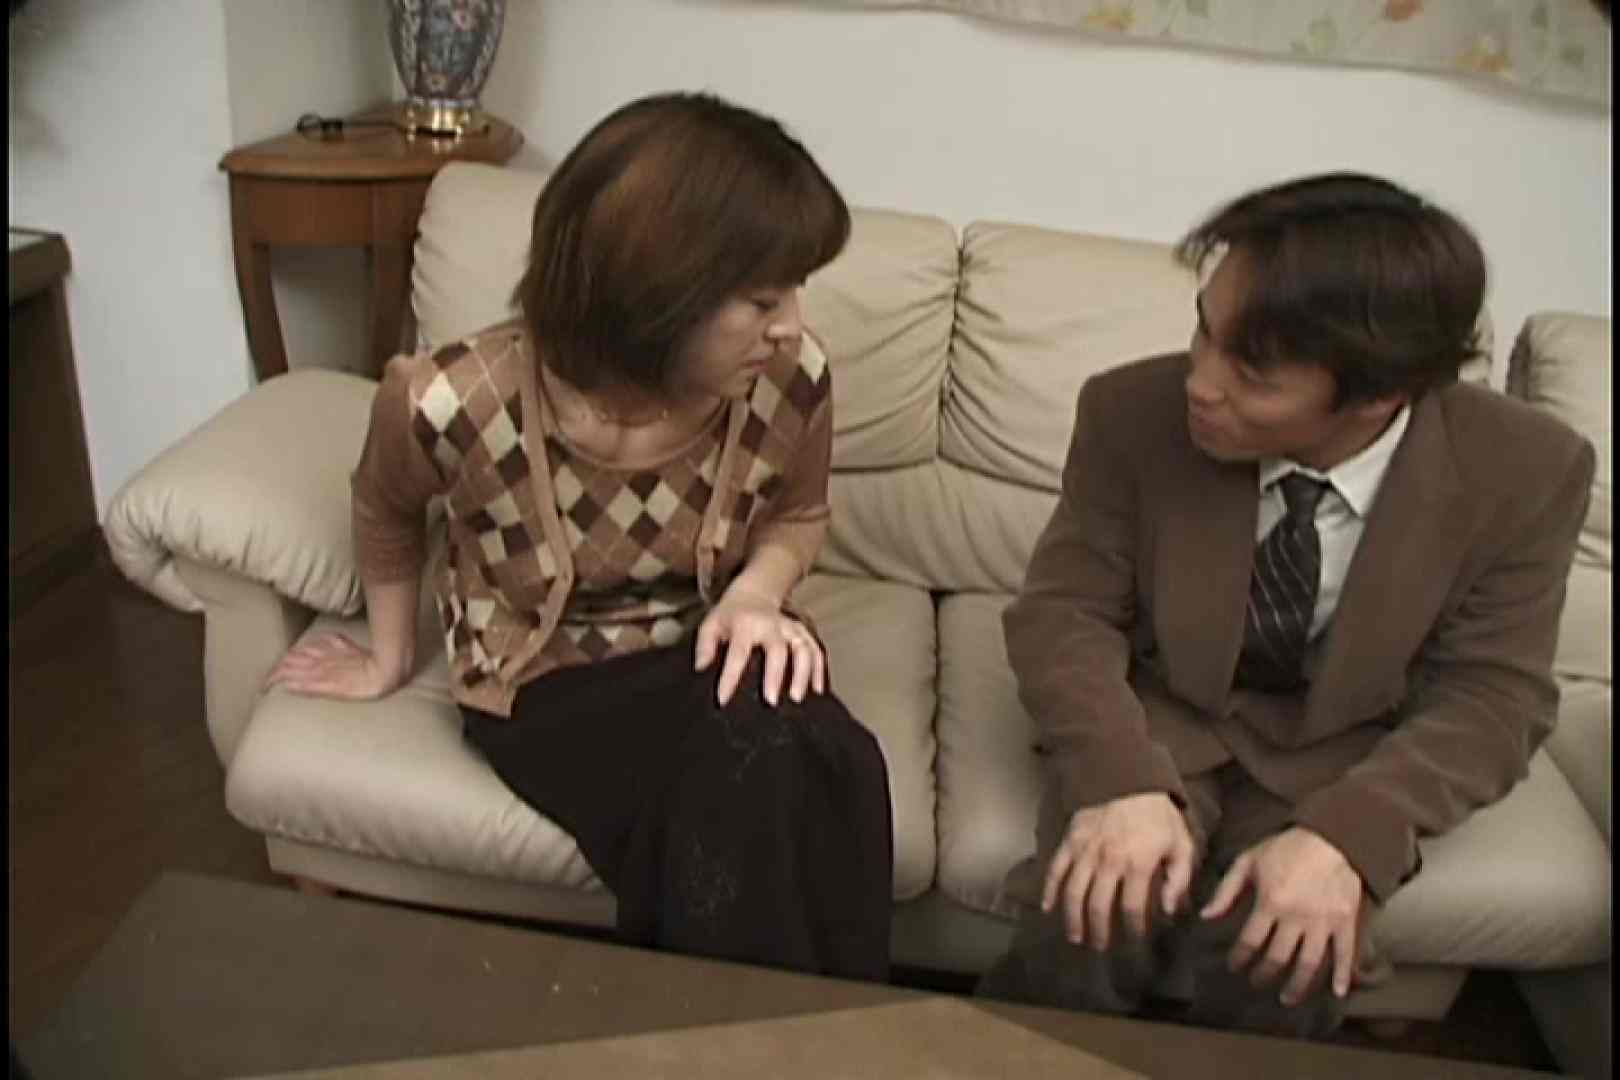 昼間の奥様は欲求不満 ~石川麻紀~ 熟女  111連発 20